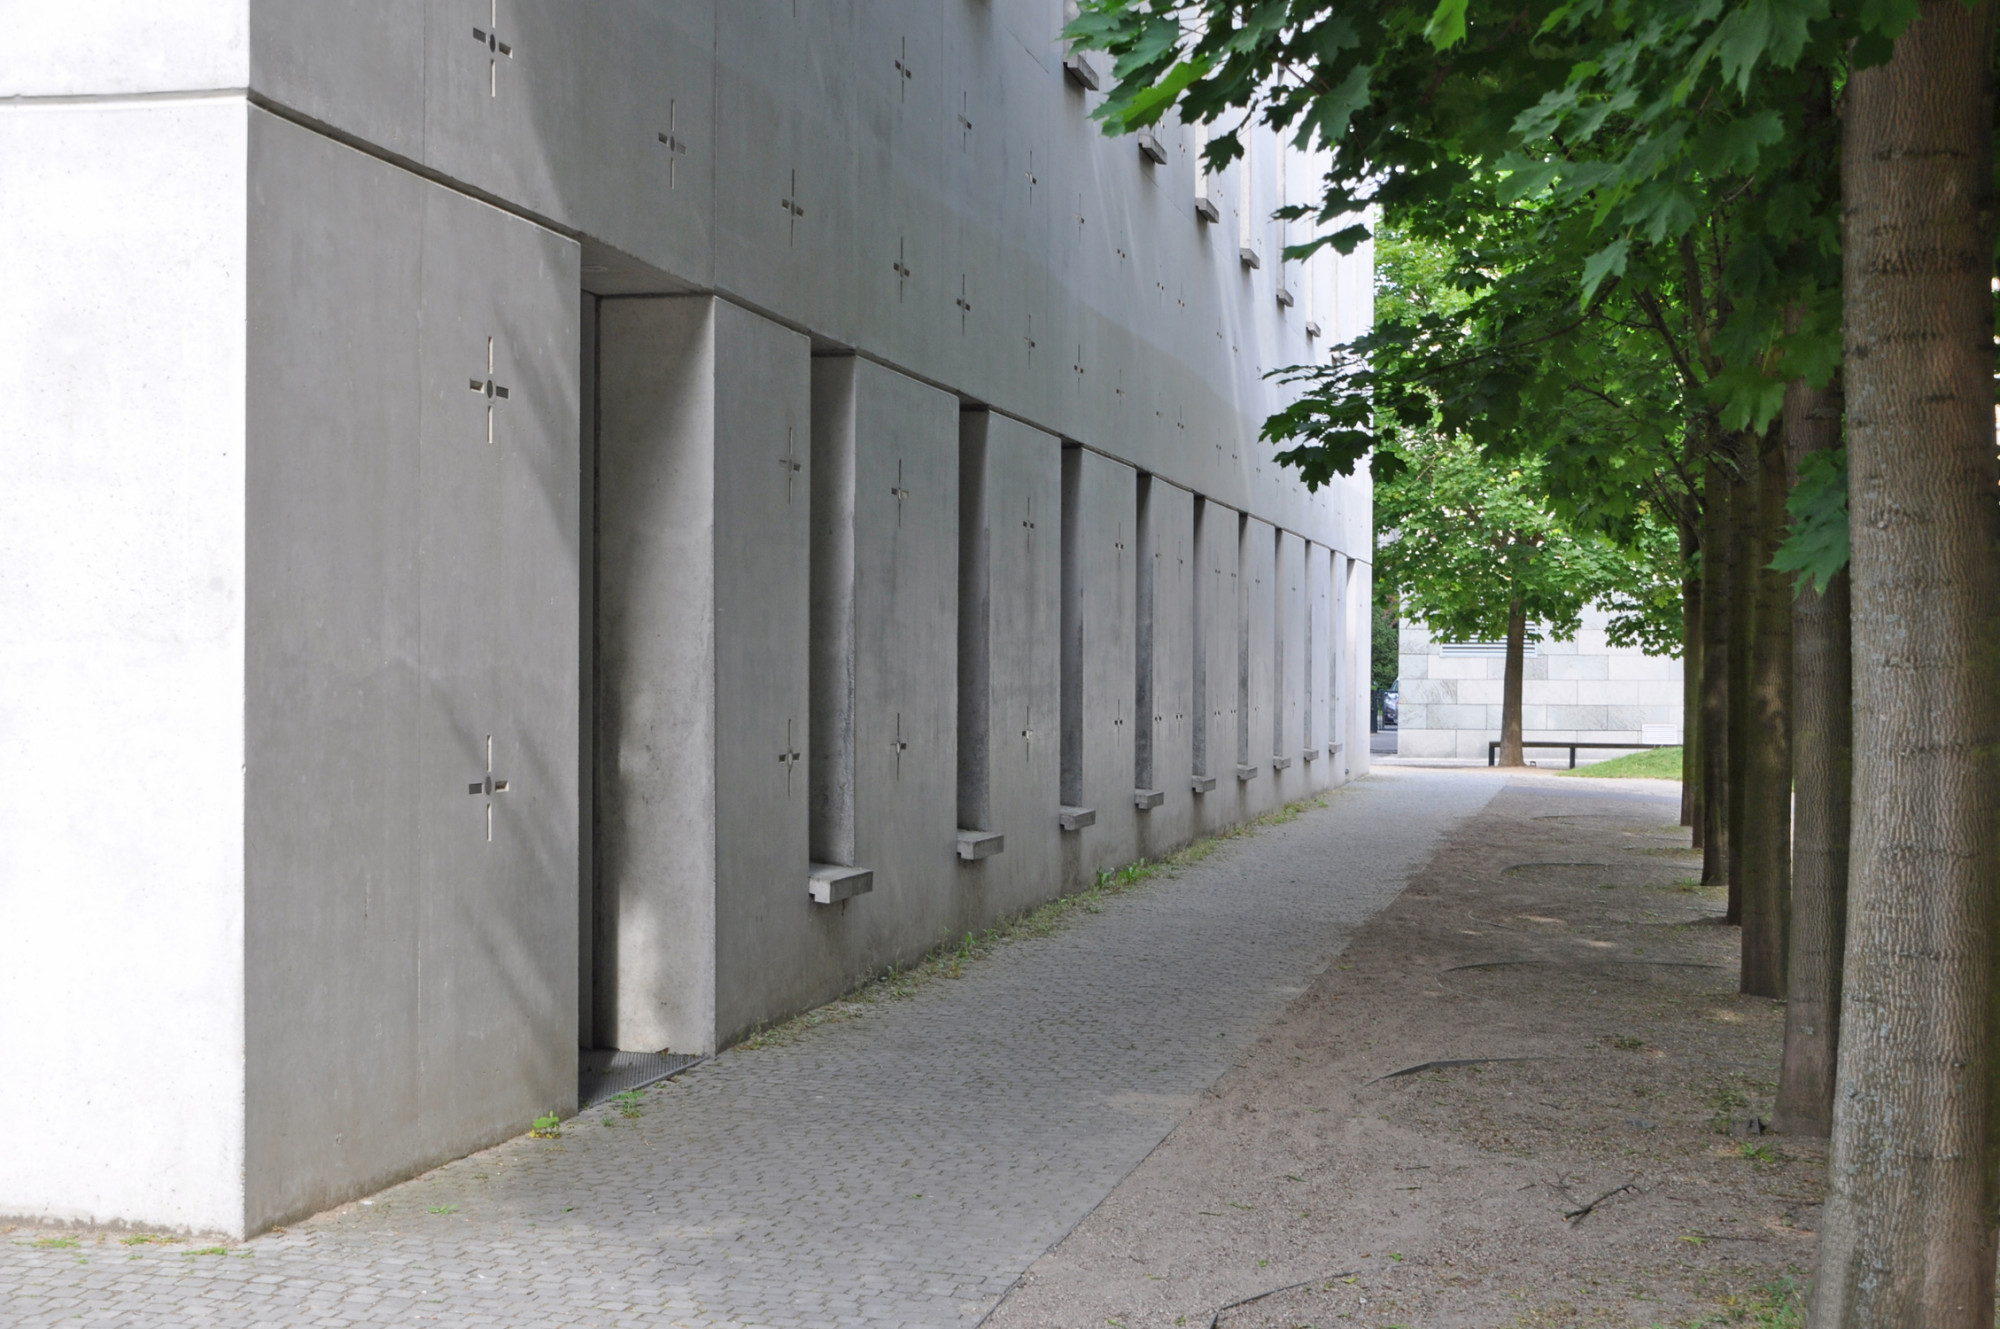 St canisius kirche in berlin bauphysik kultur bildung - Schmale fenster ...